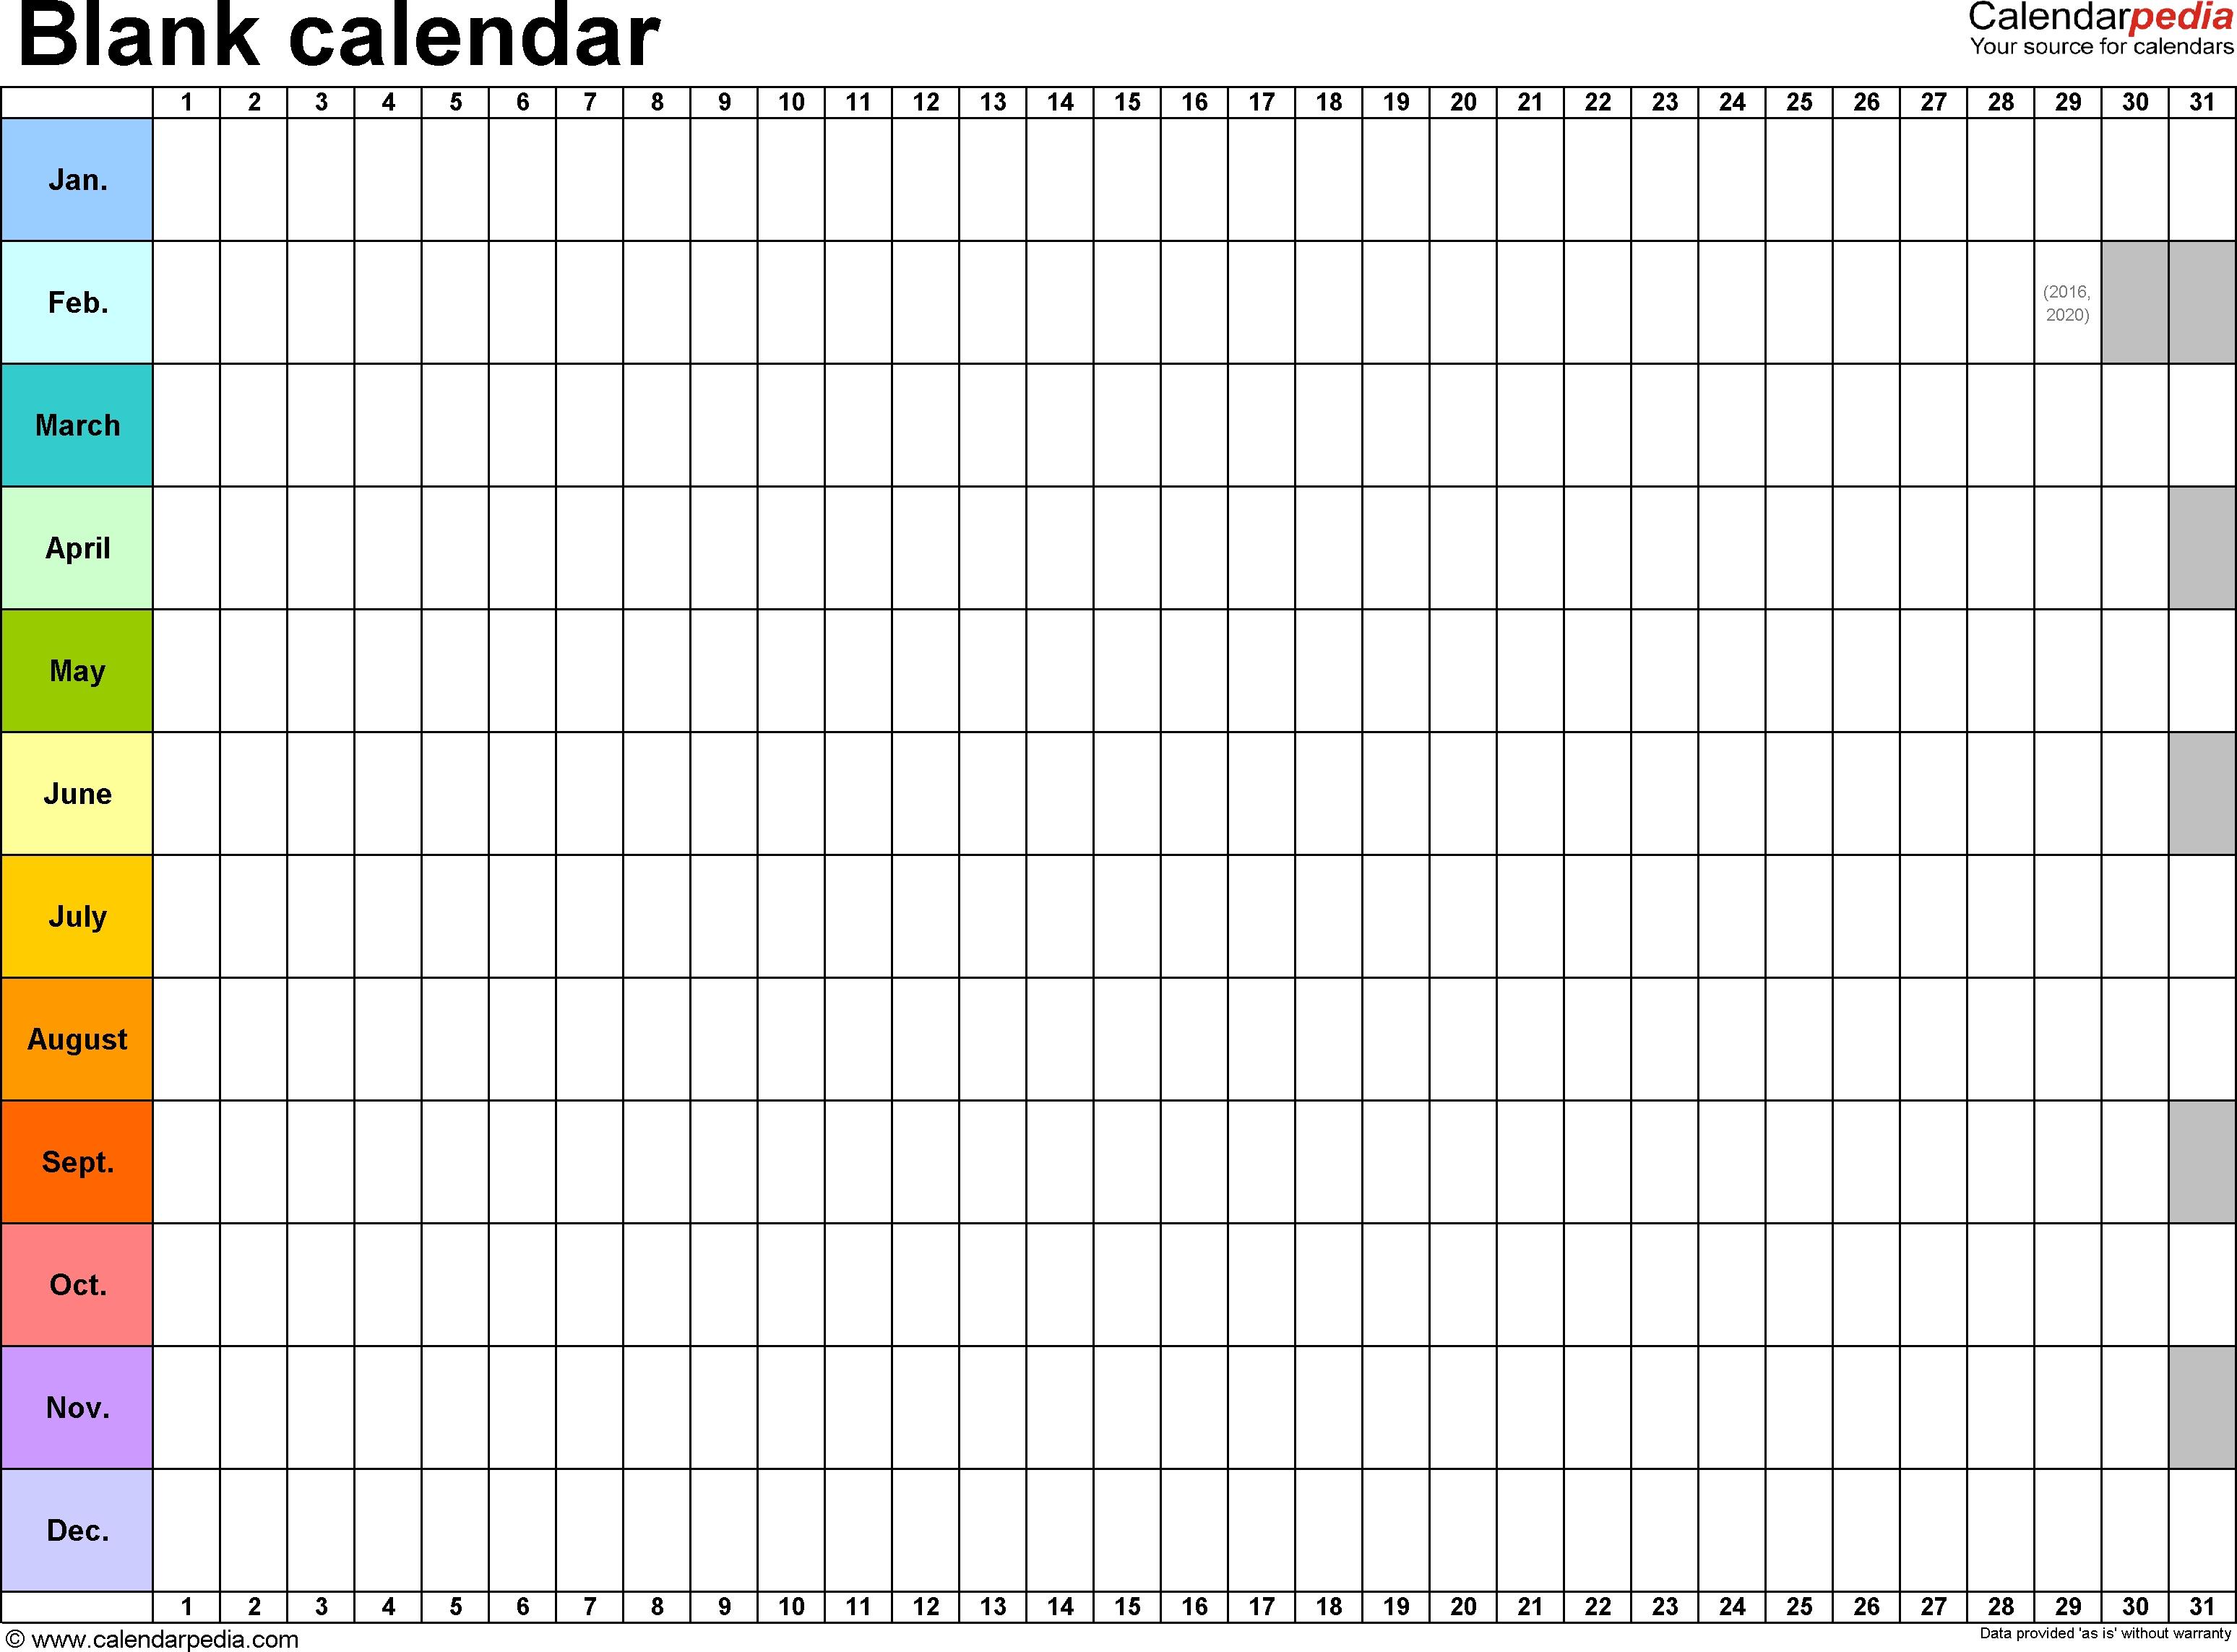 Blank Calendar - 9 Free Printable Microsoft Word Templates in 12 Week Blank Calendar Printable